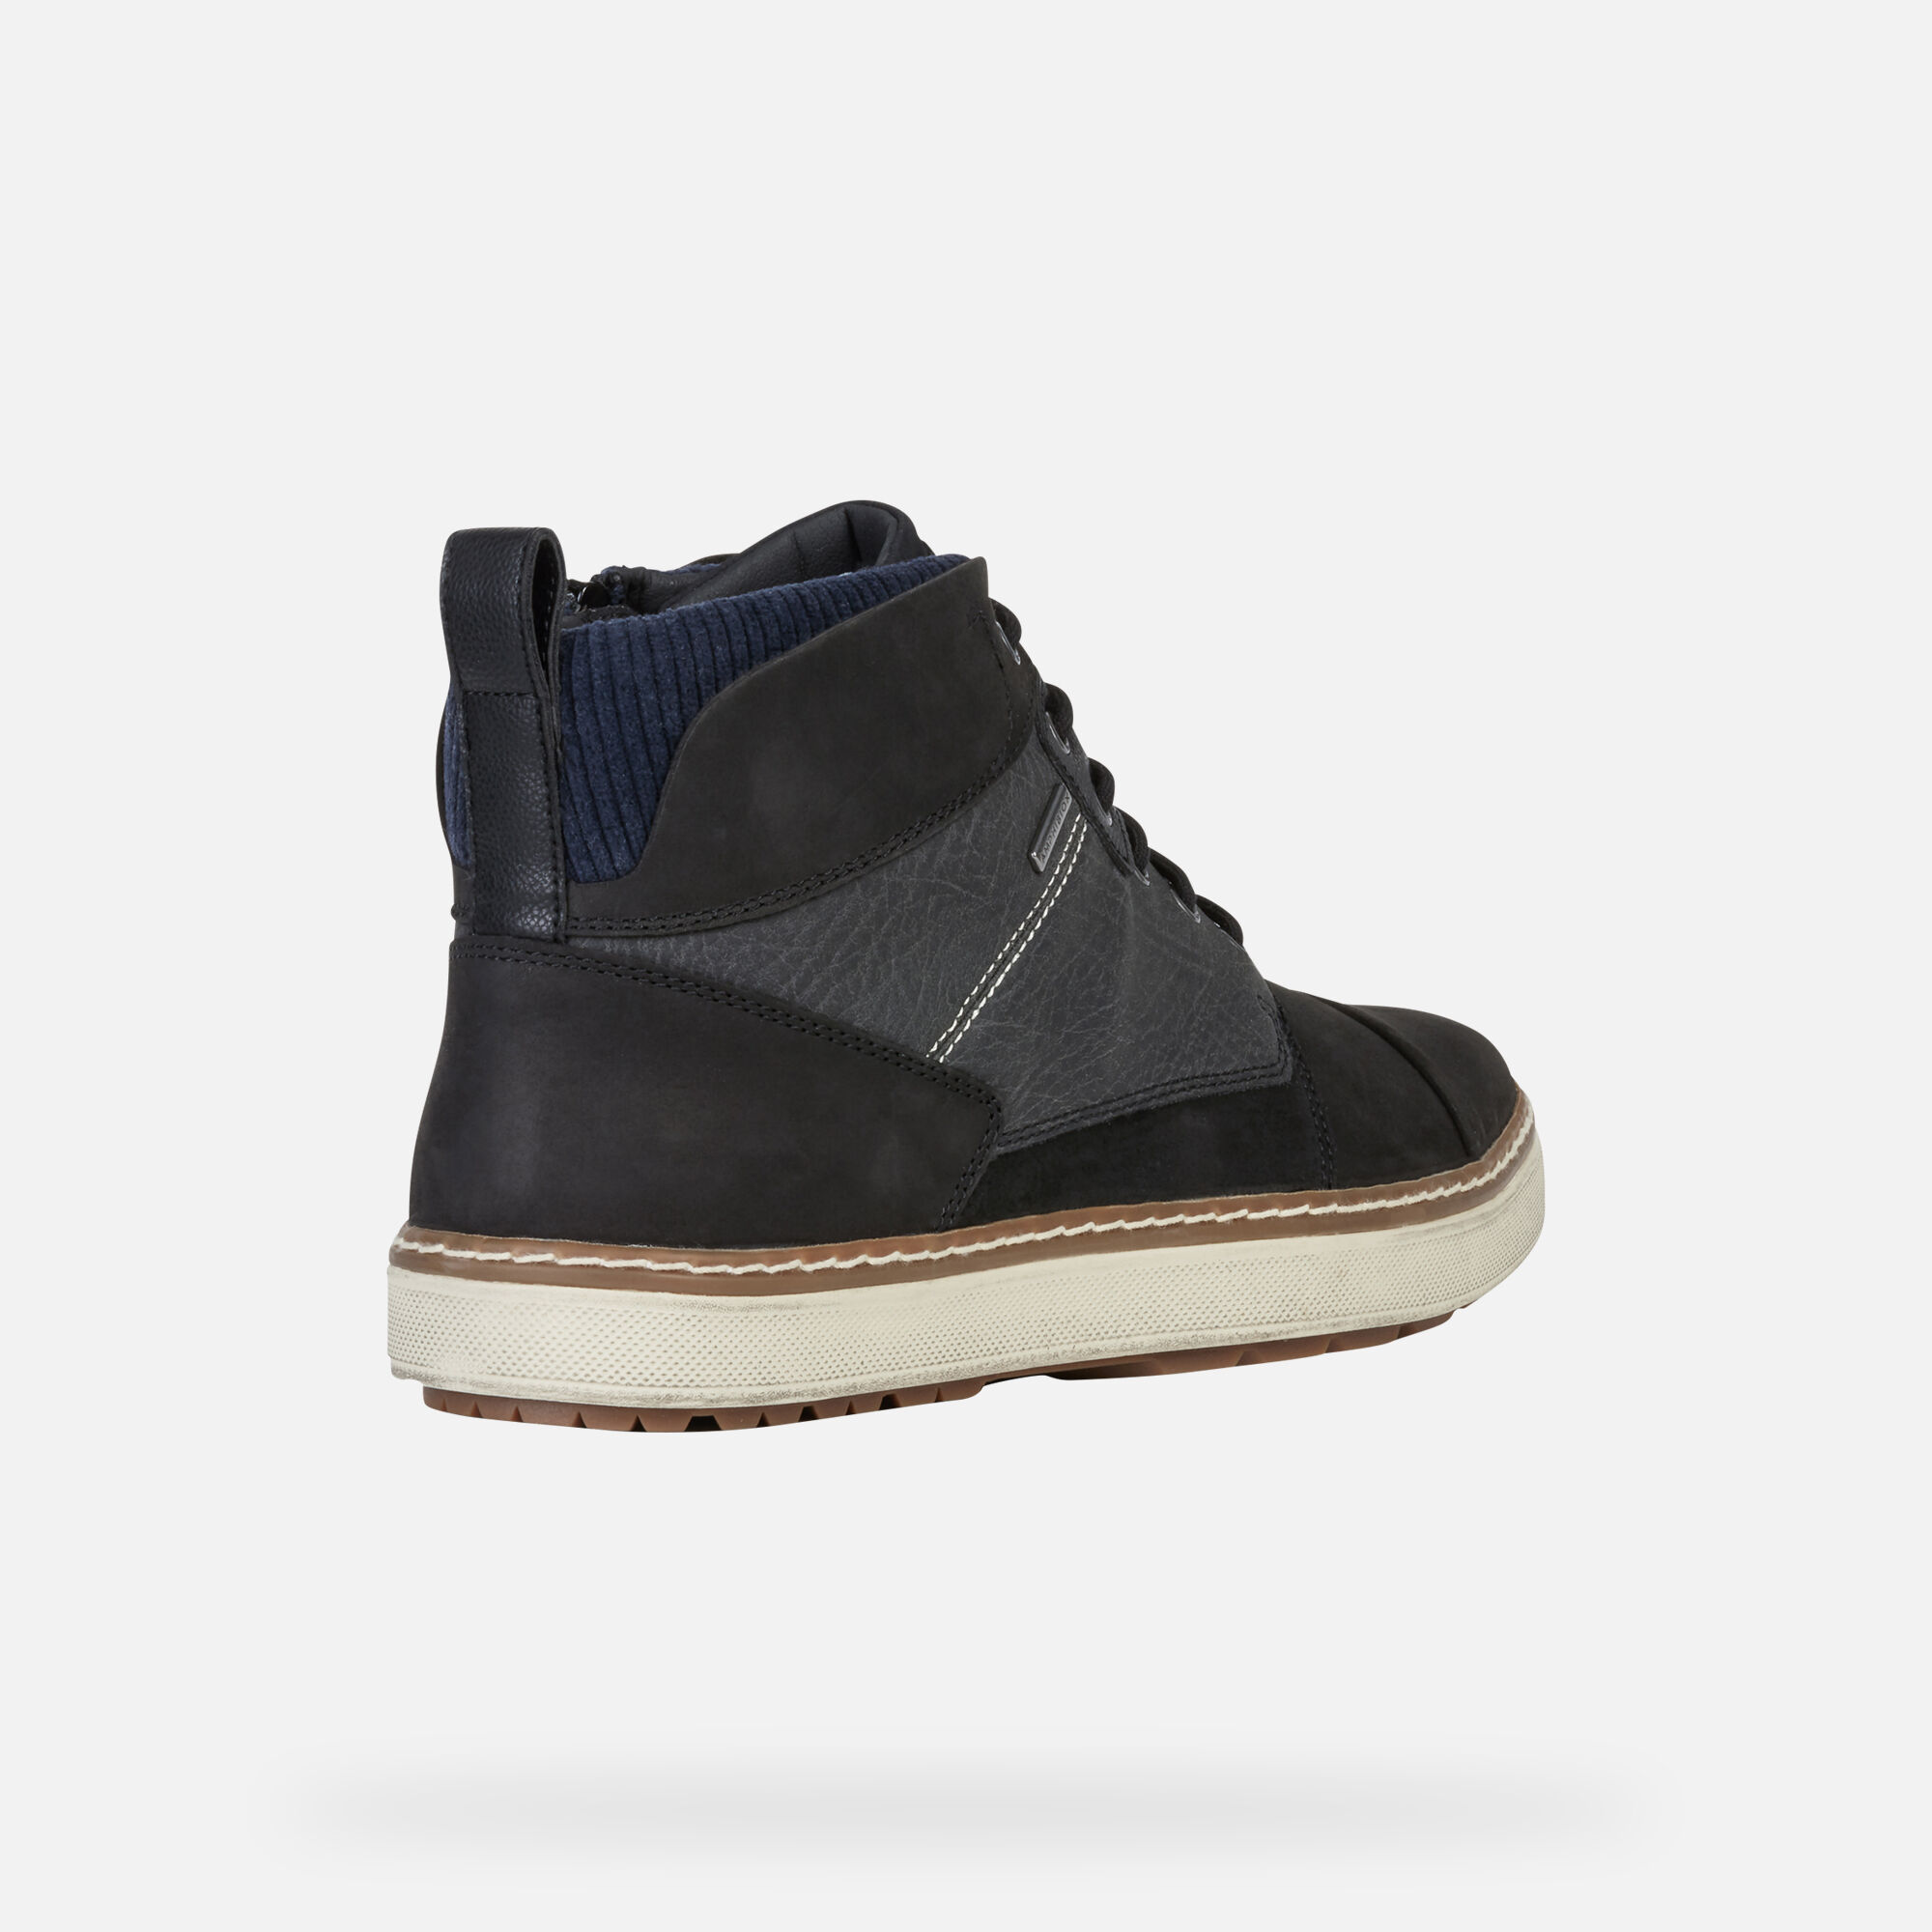 Geox U MATTIAS B ABX: Sneakers Alte da Uomo | Geox sito